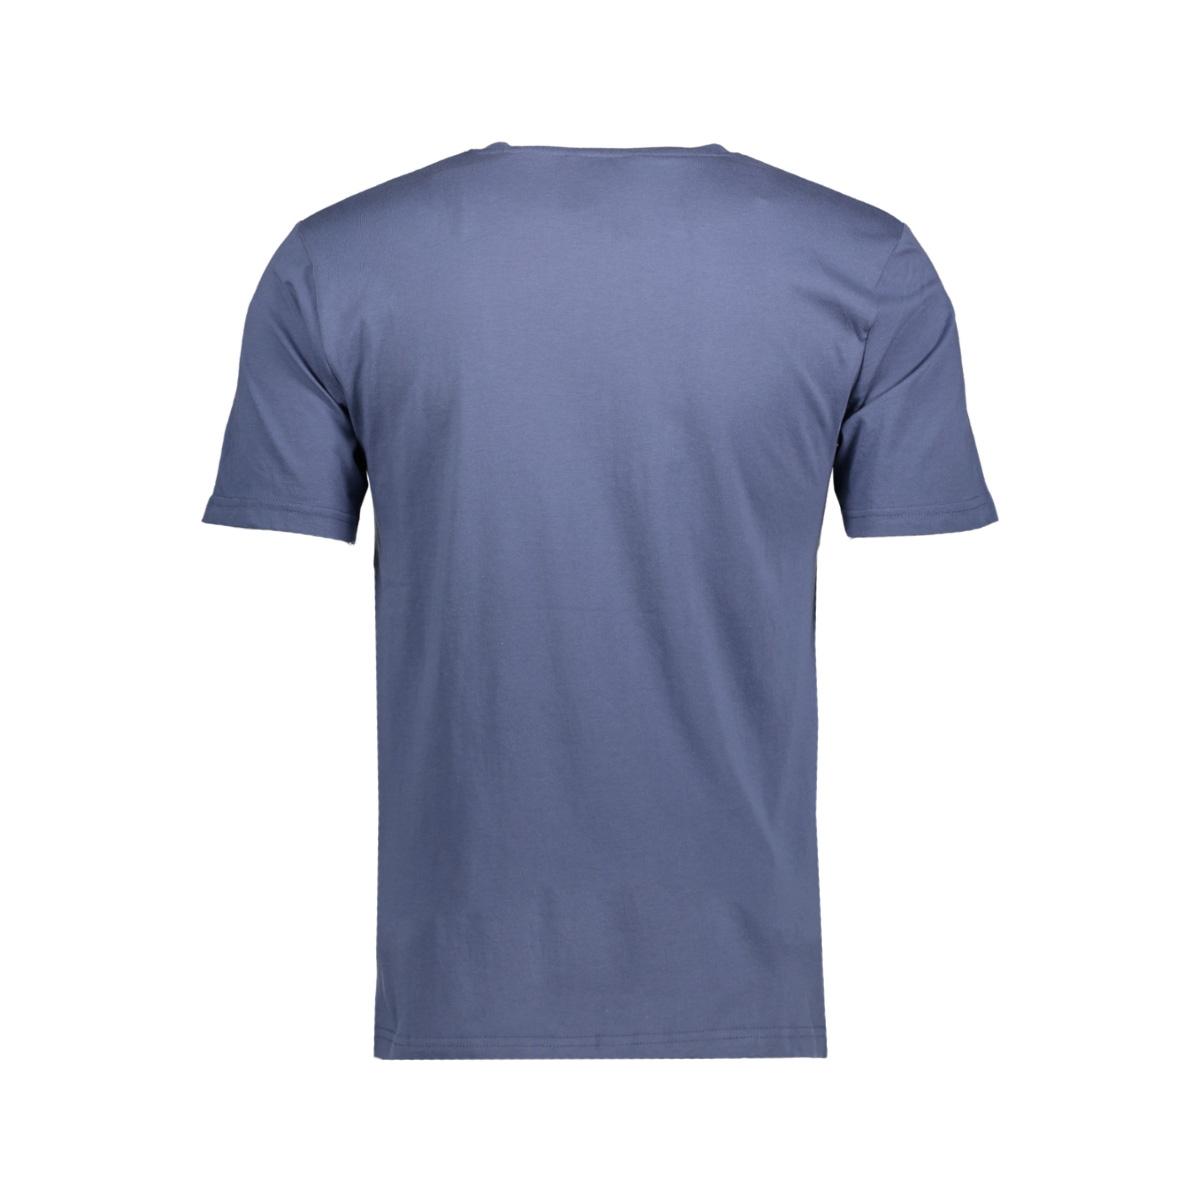 onsmerek o-neck exp 22008061 only & sons t-shirt vintage indigo